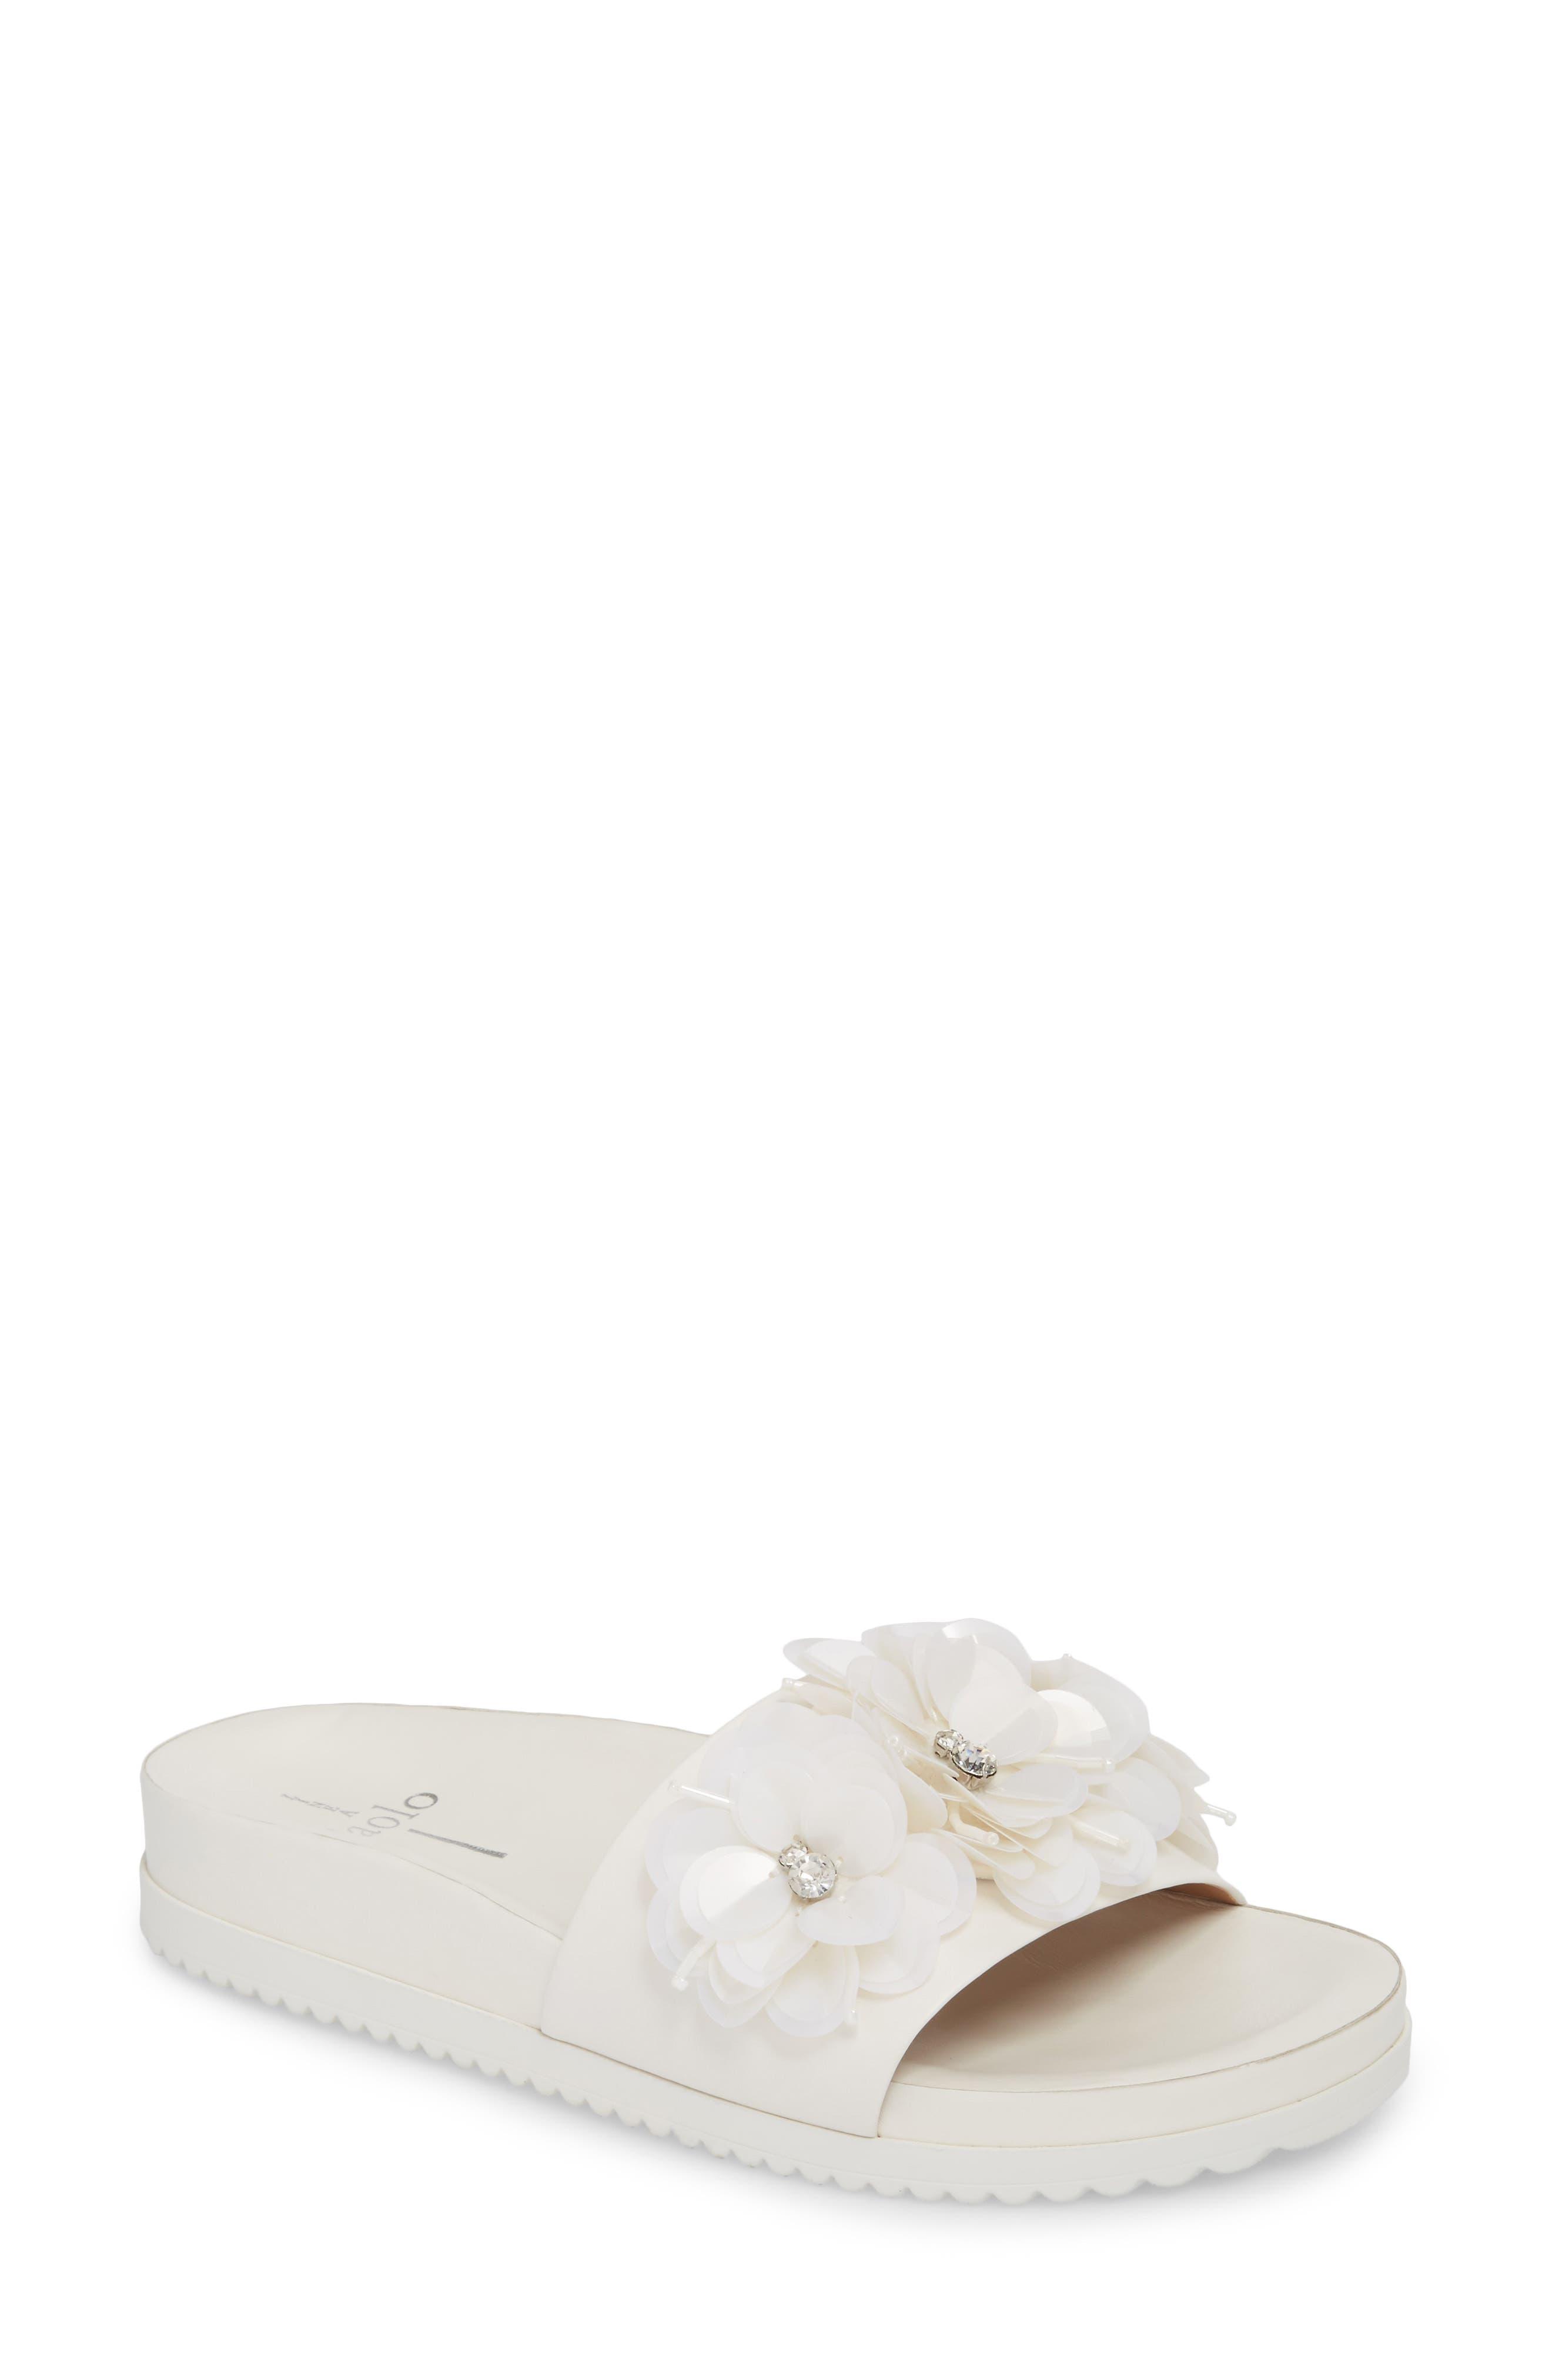 Linea Paolo Lotus Embellished Flower Sandal Slide (Women)